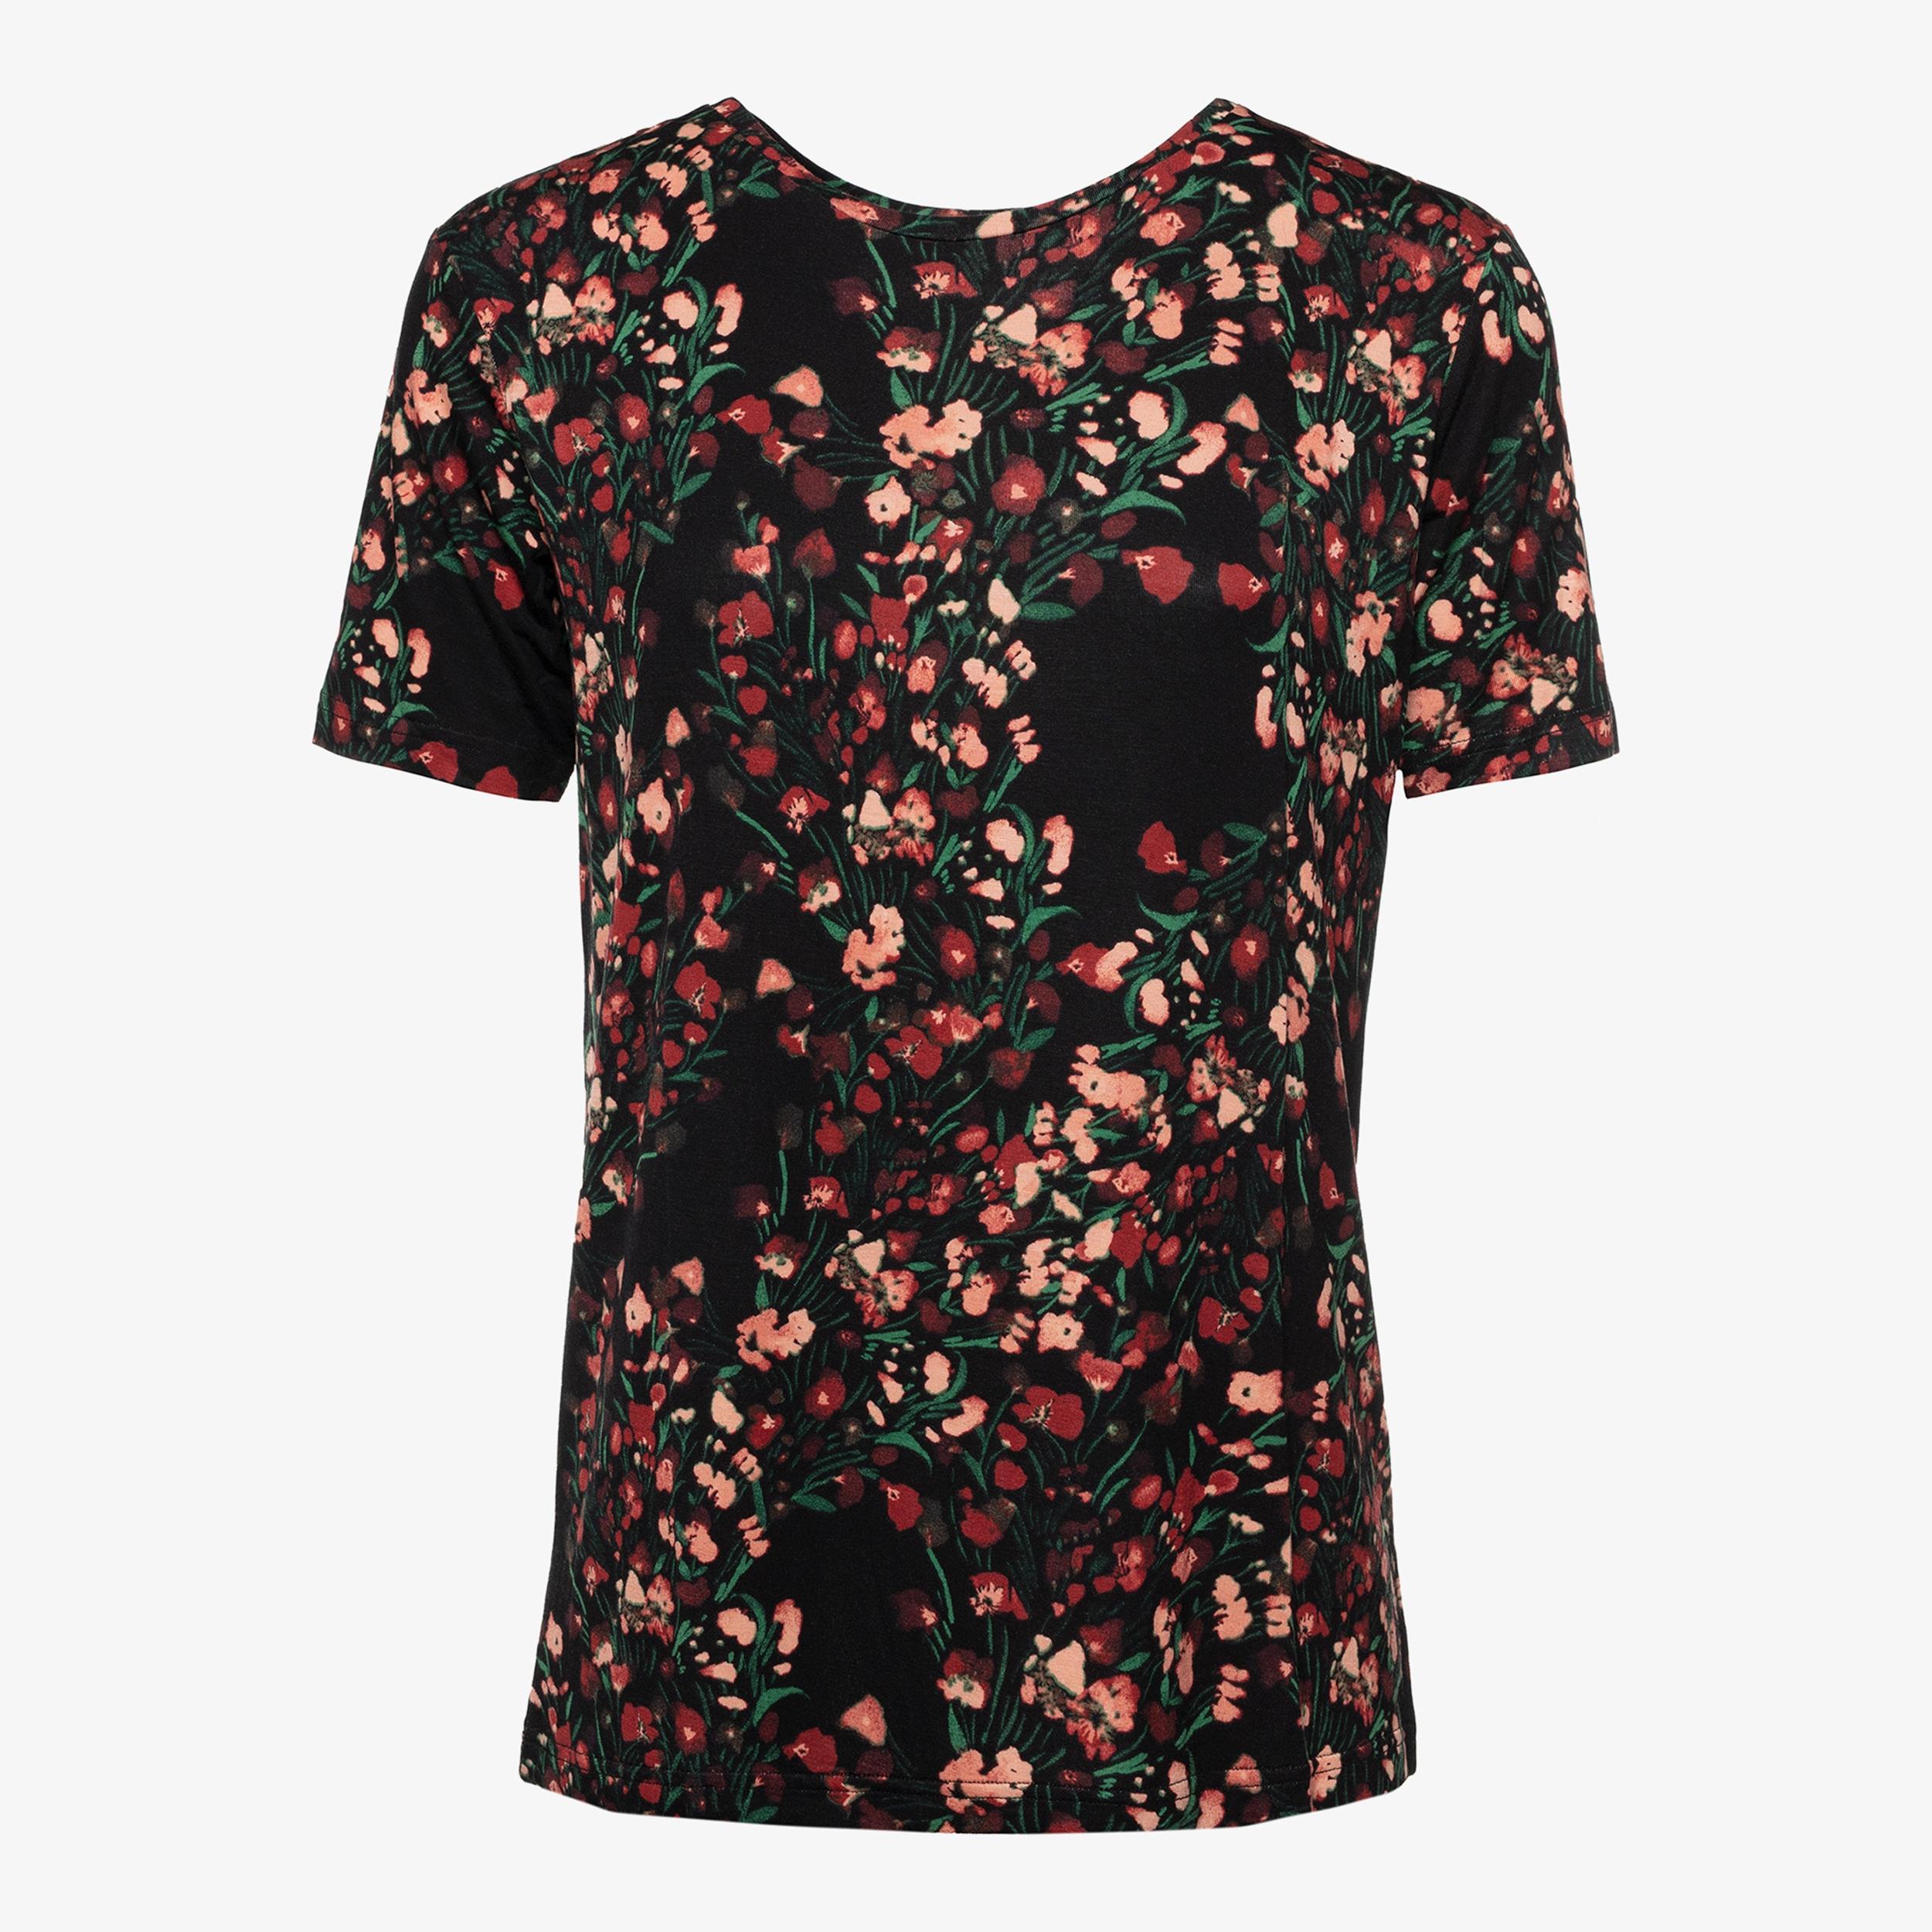 Jazlyn dames T shirt met luipaardprint online bestellen